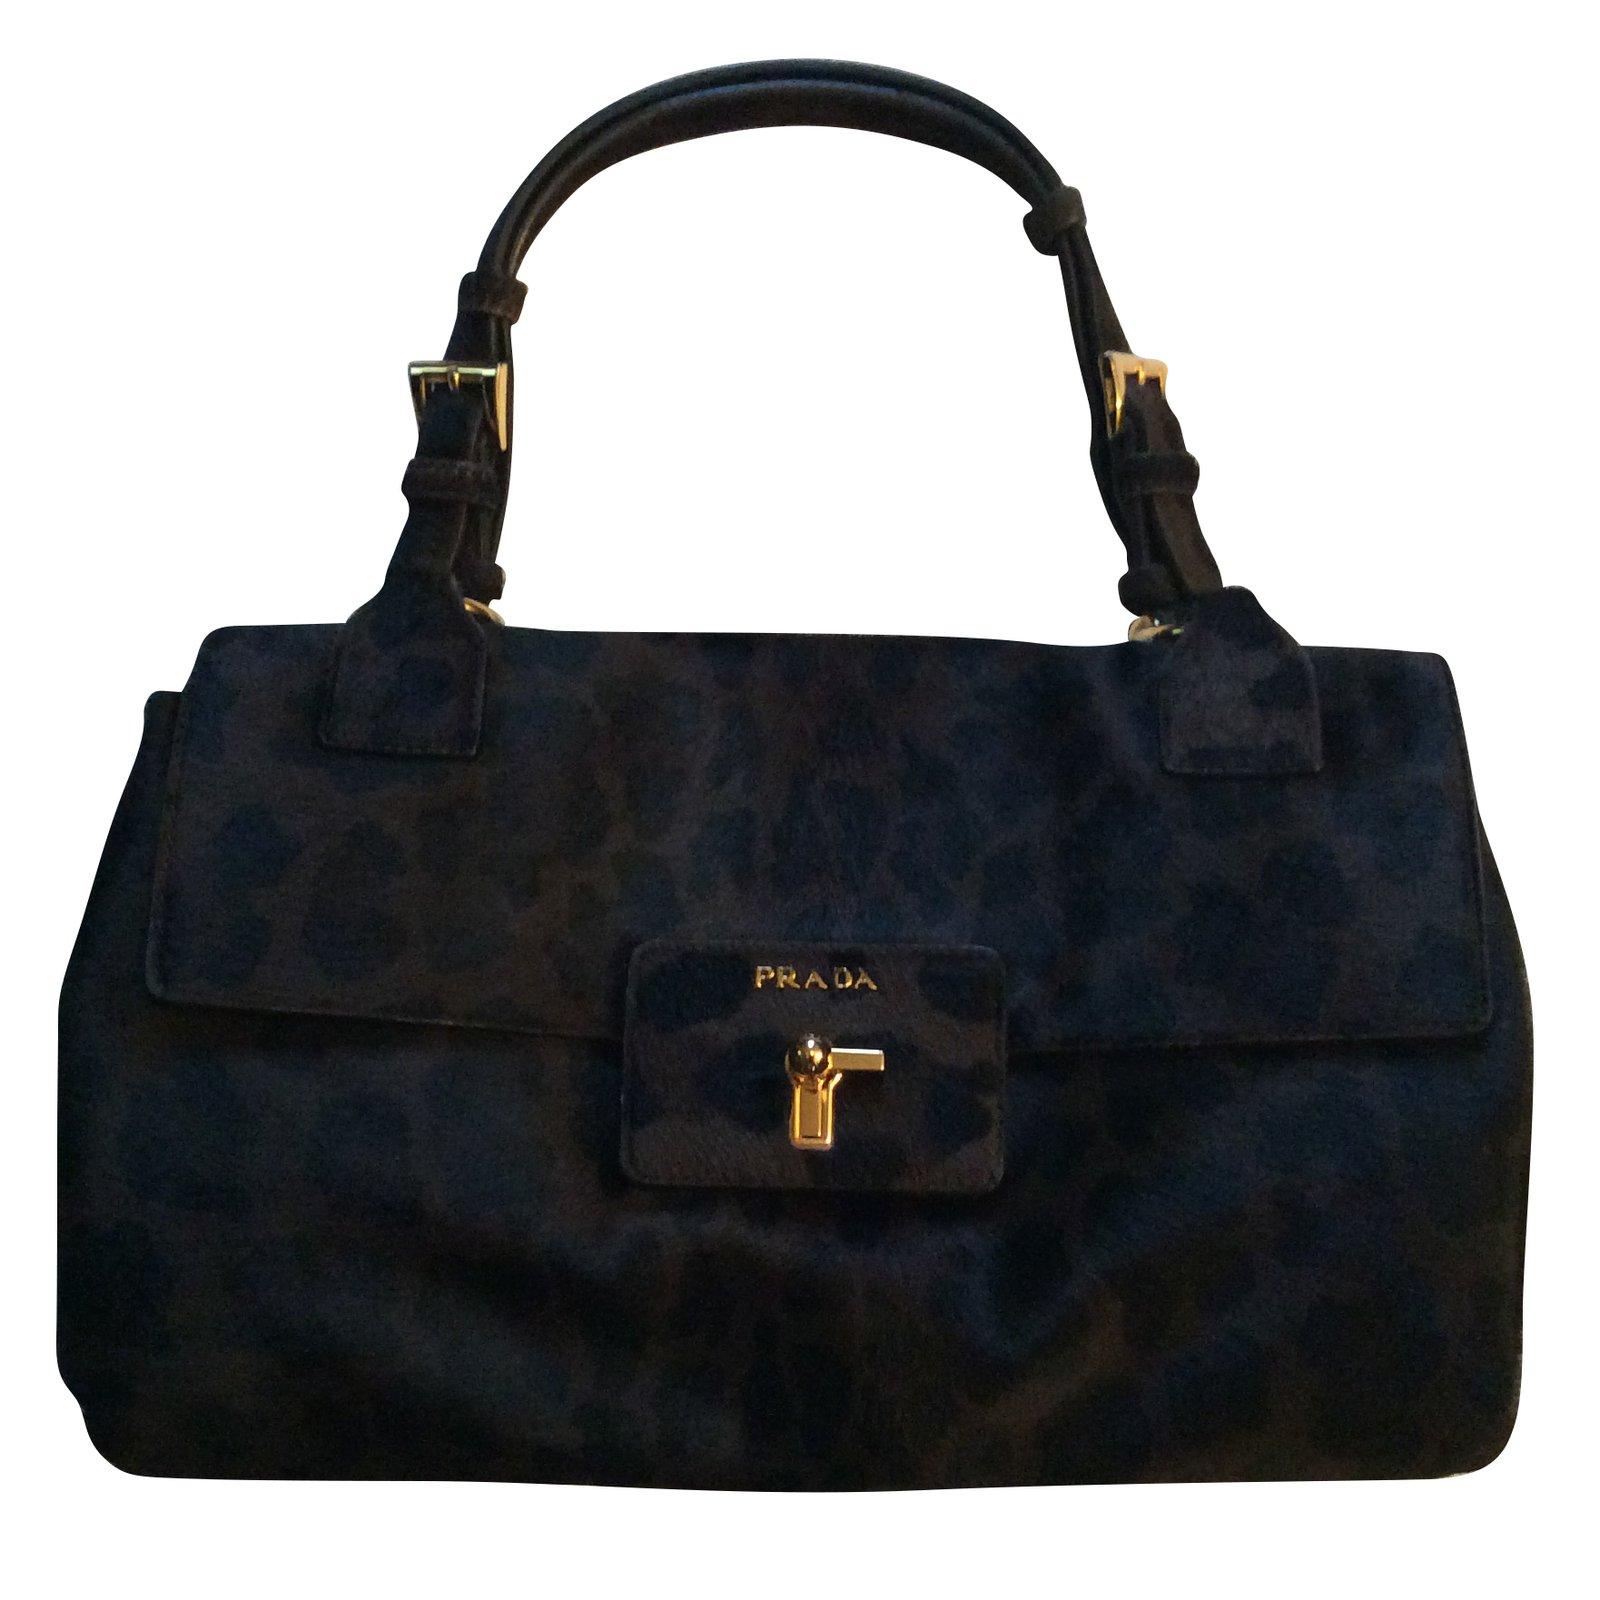 ... new zealand prada handbags handbags pony style calfskin dark brown  ref.55892 117de cf0c5 1b9c4c01a02ed